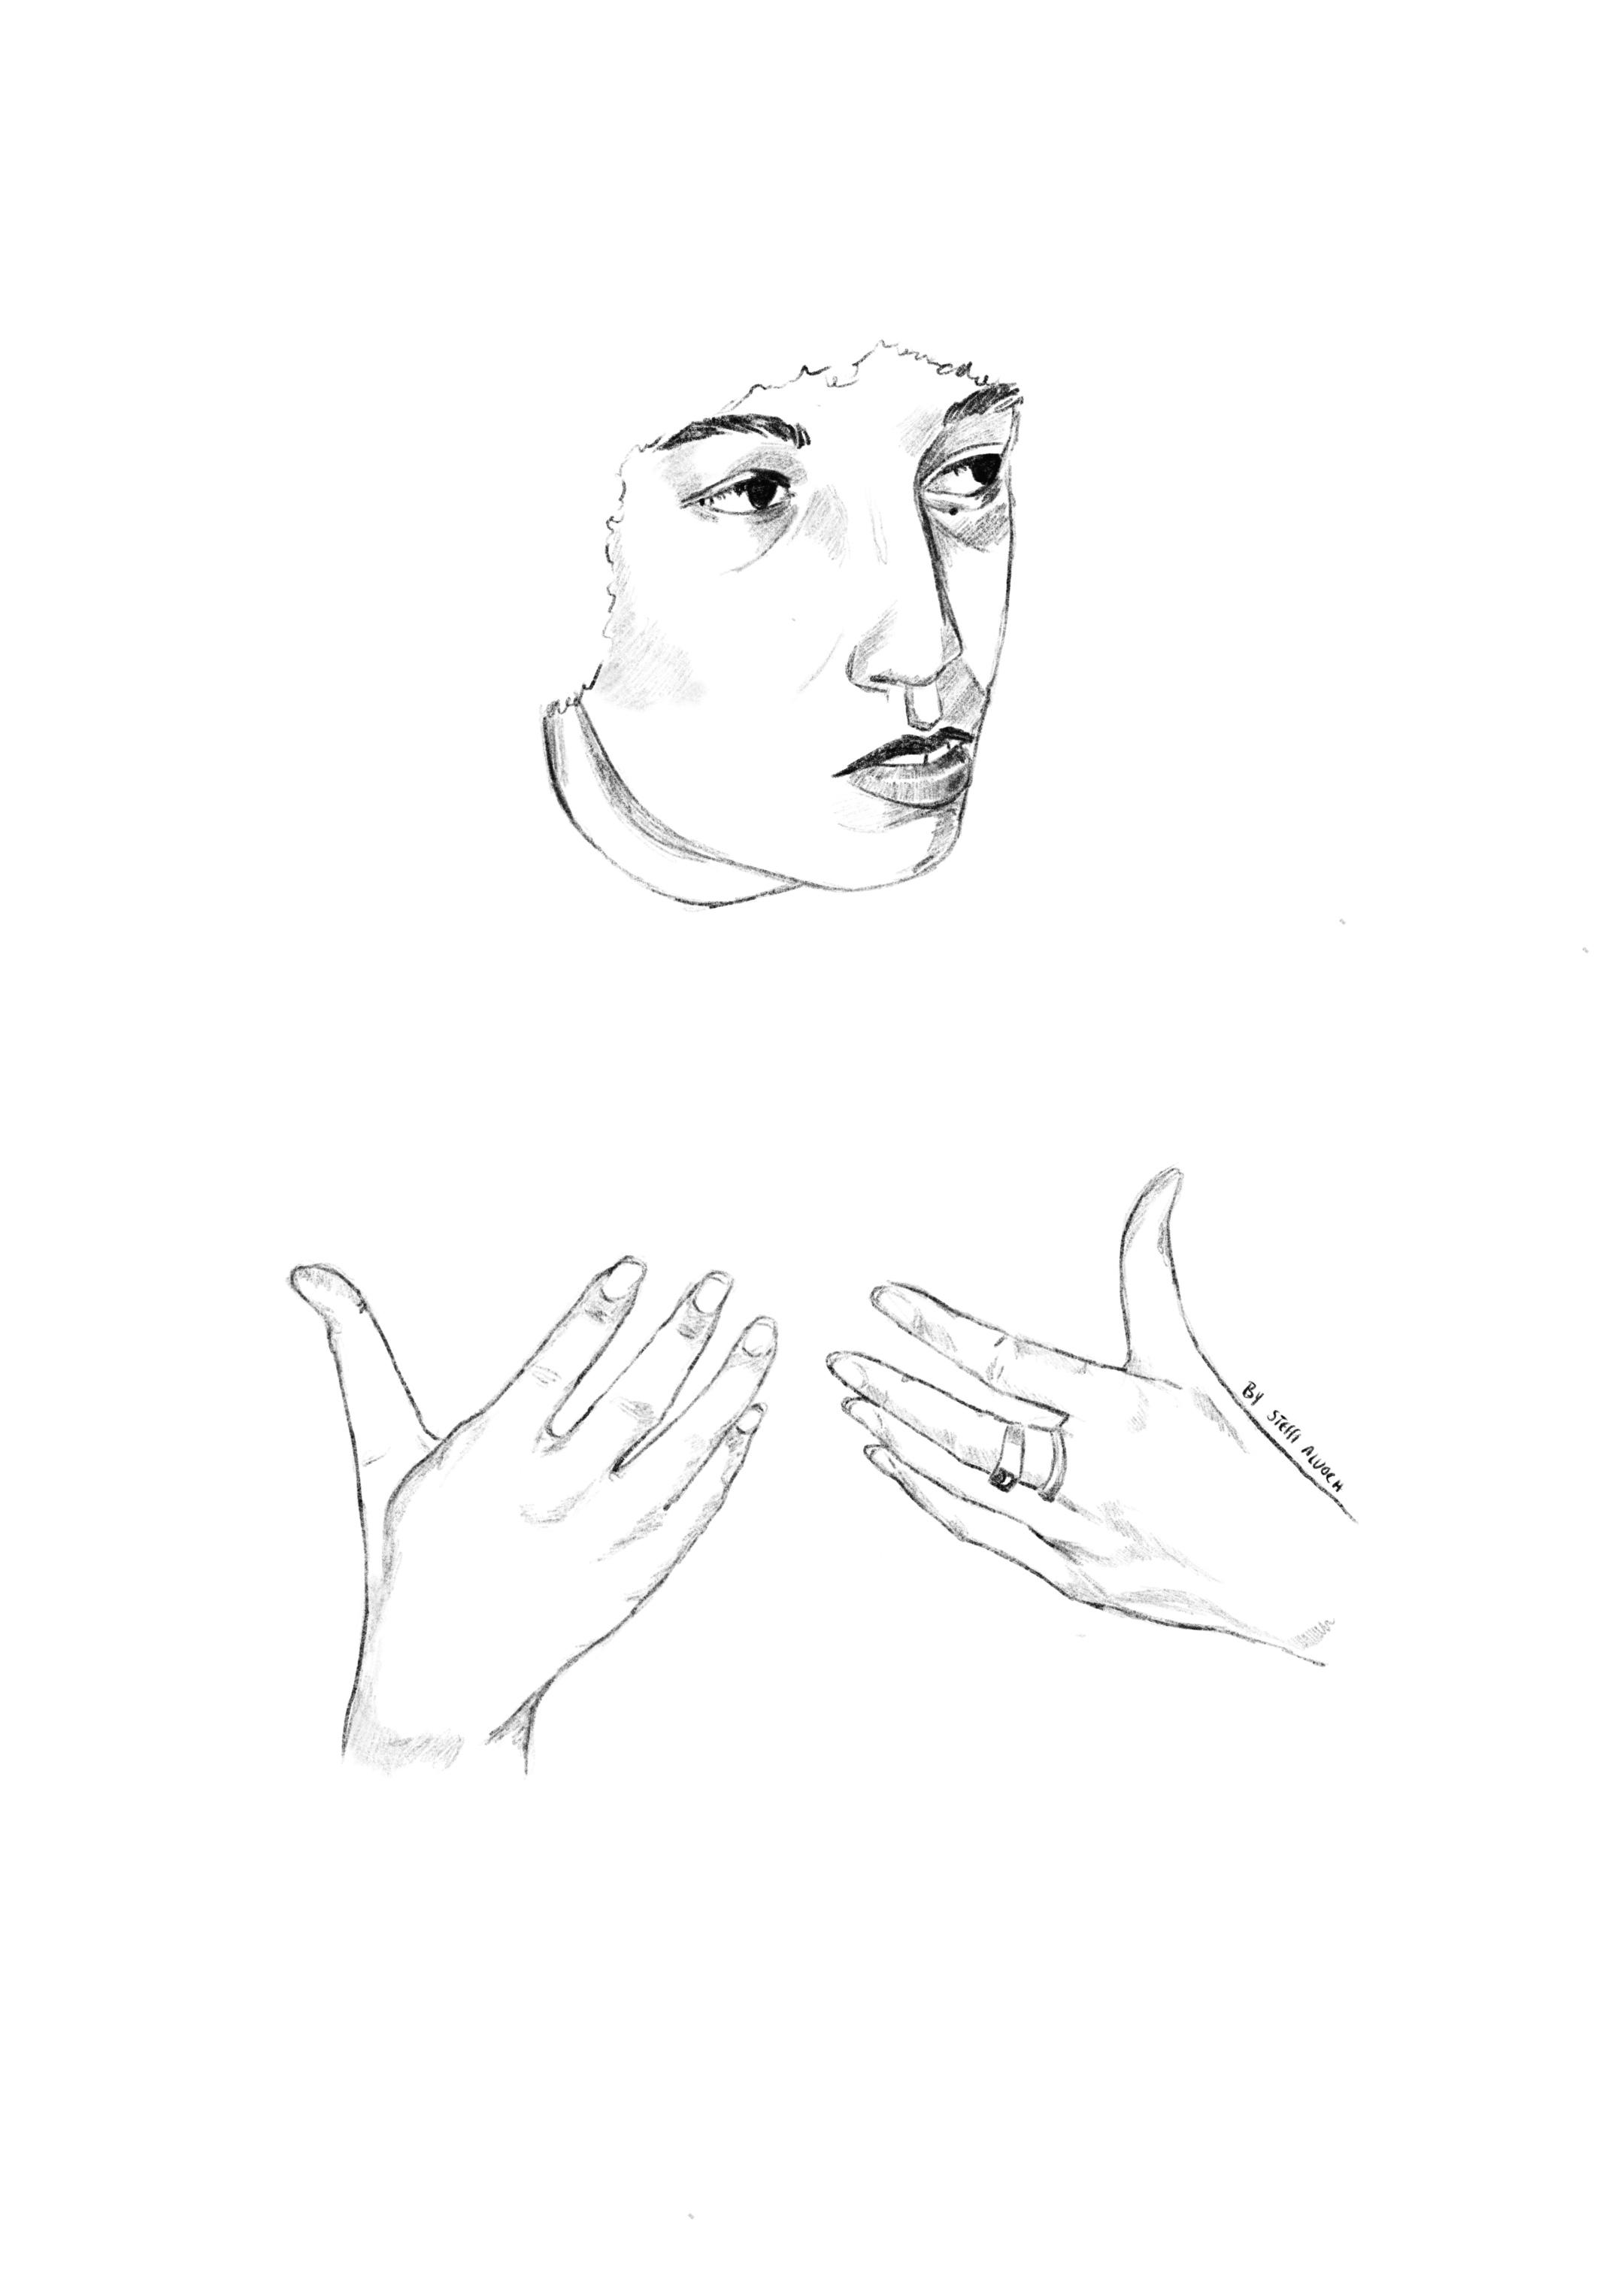 Full sketchangeladavis